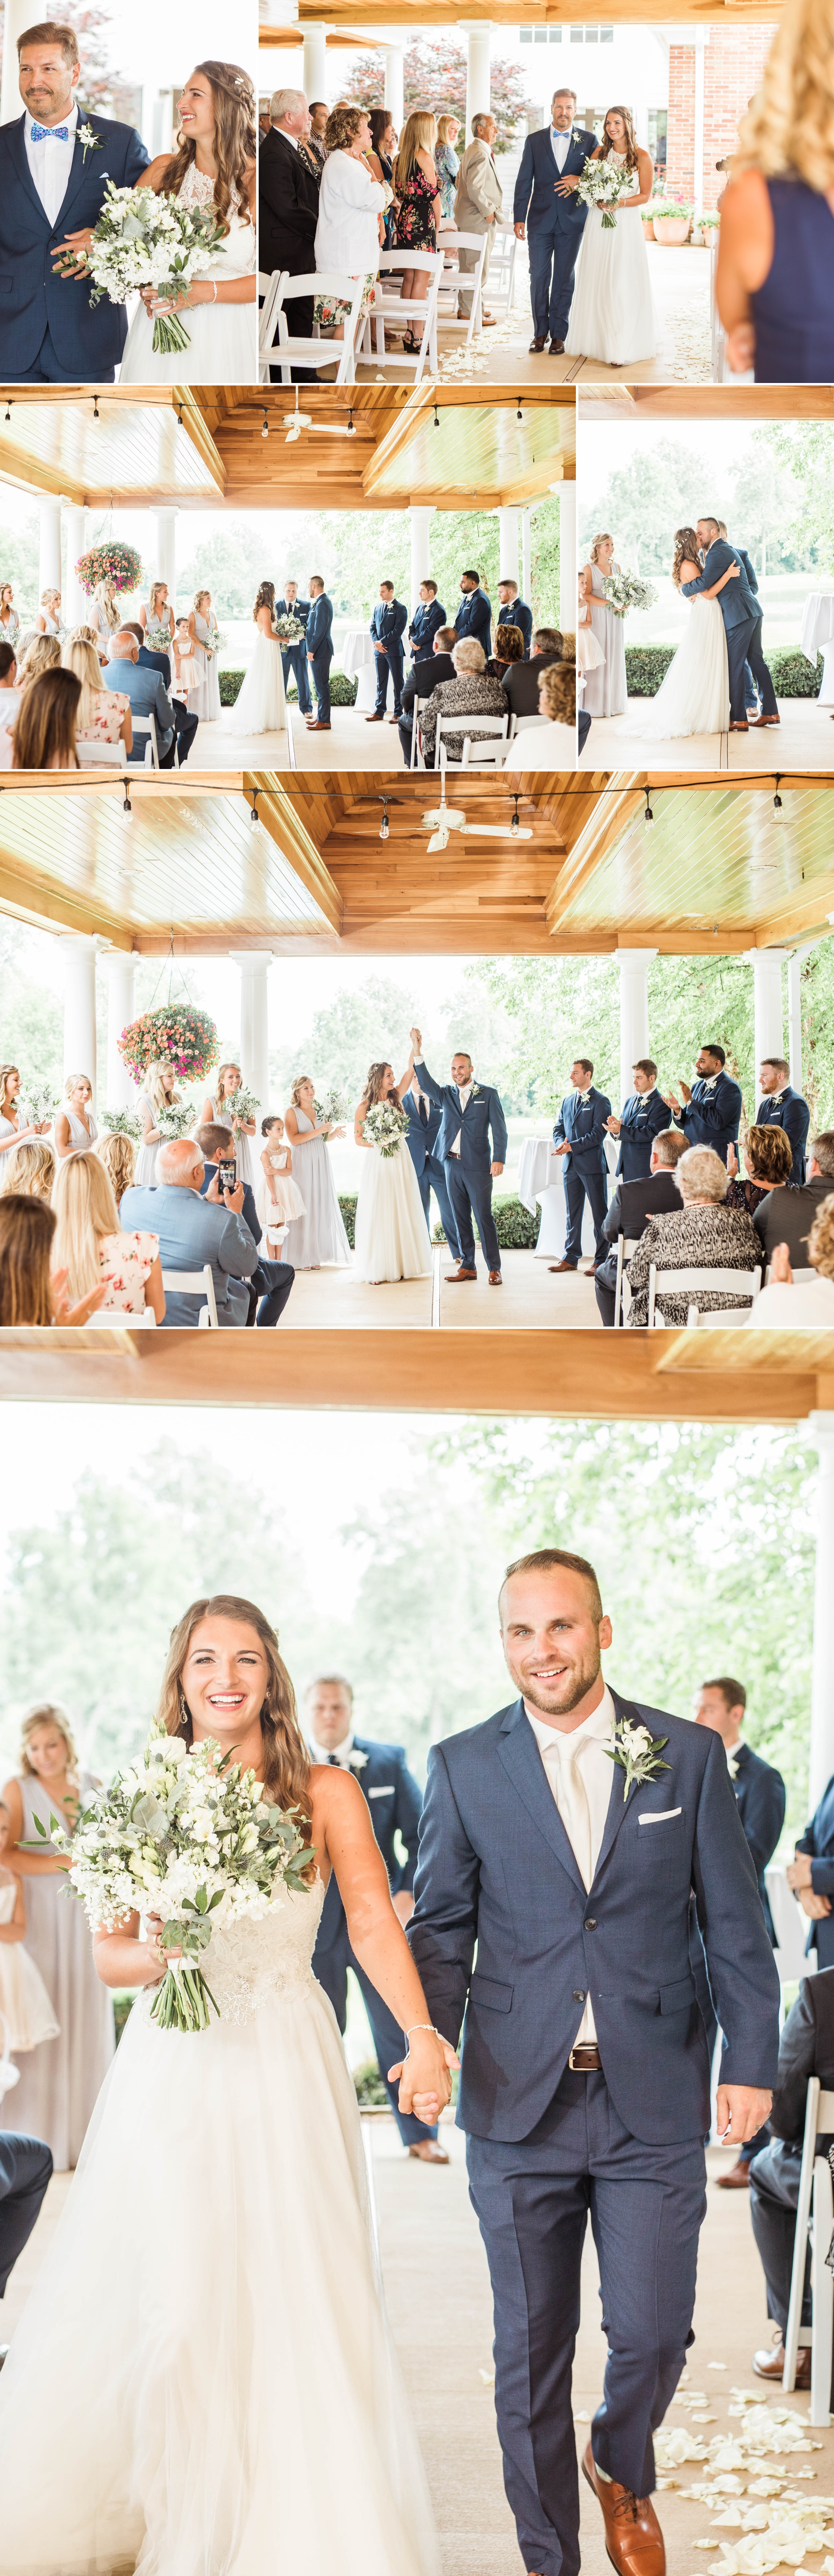 bride groom indiana wedding ceremony outdoors patio